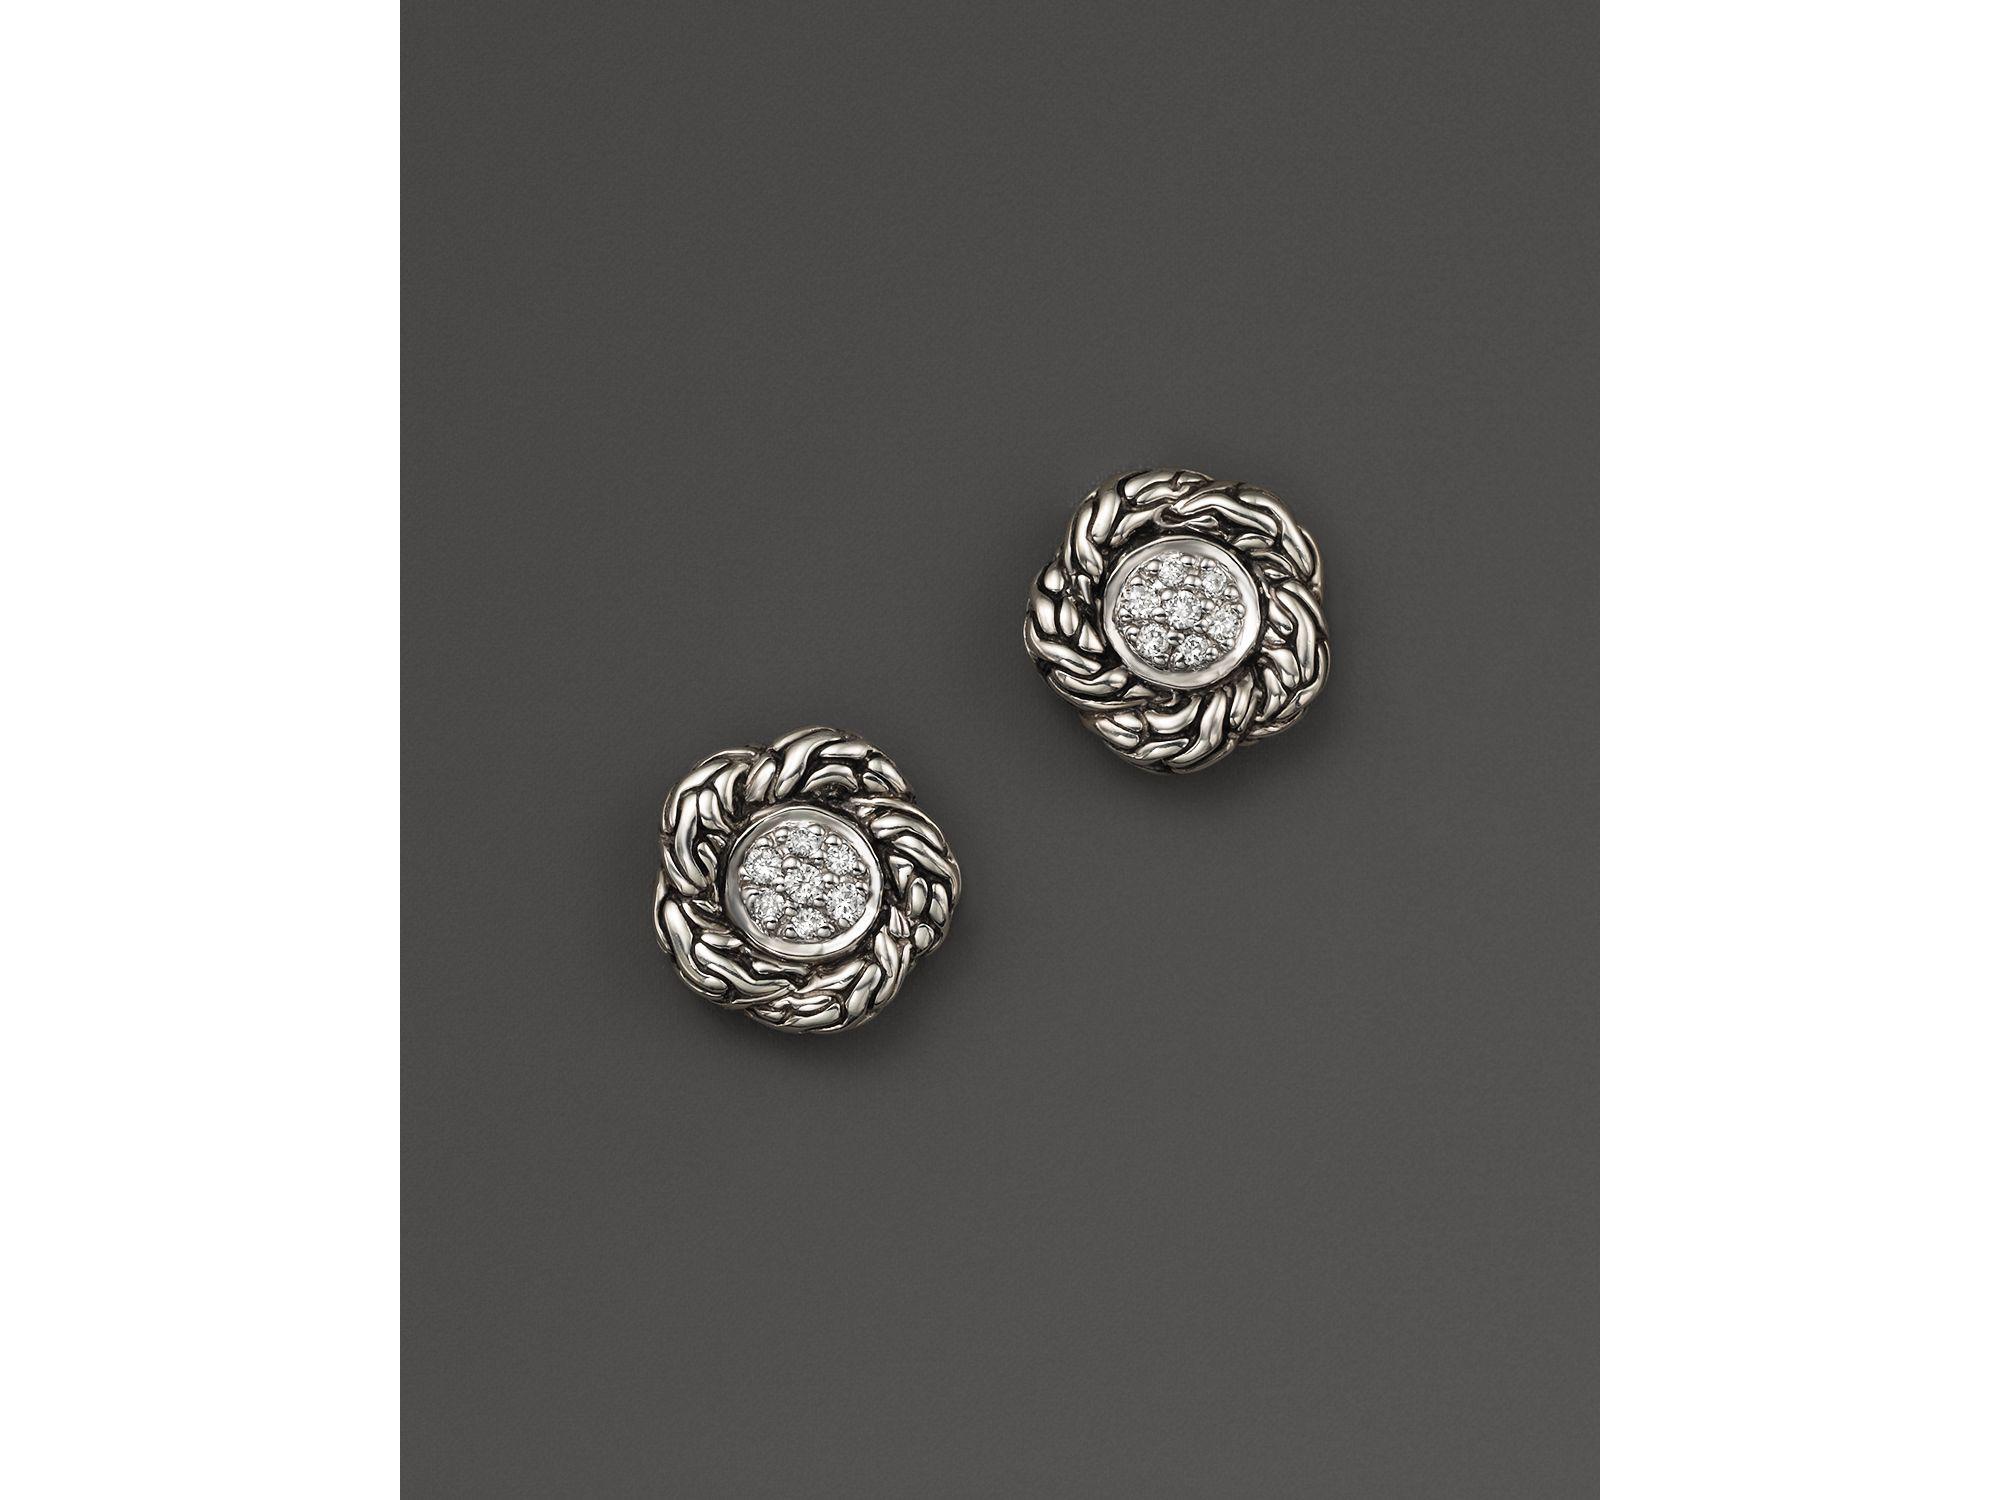 dab40ddfecfb2 John Hardy Metallic Sterling Silver Classic Chain Pavé Diamond Small Stud  Earrings